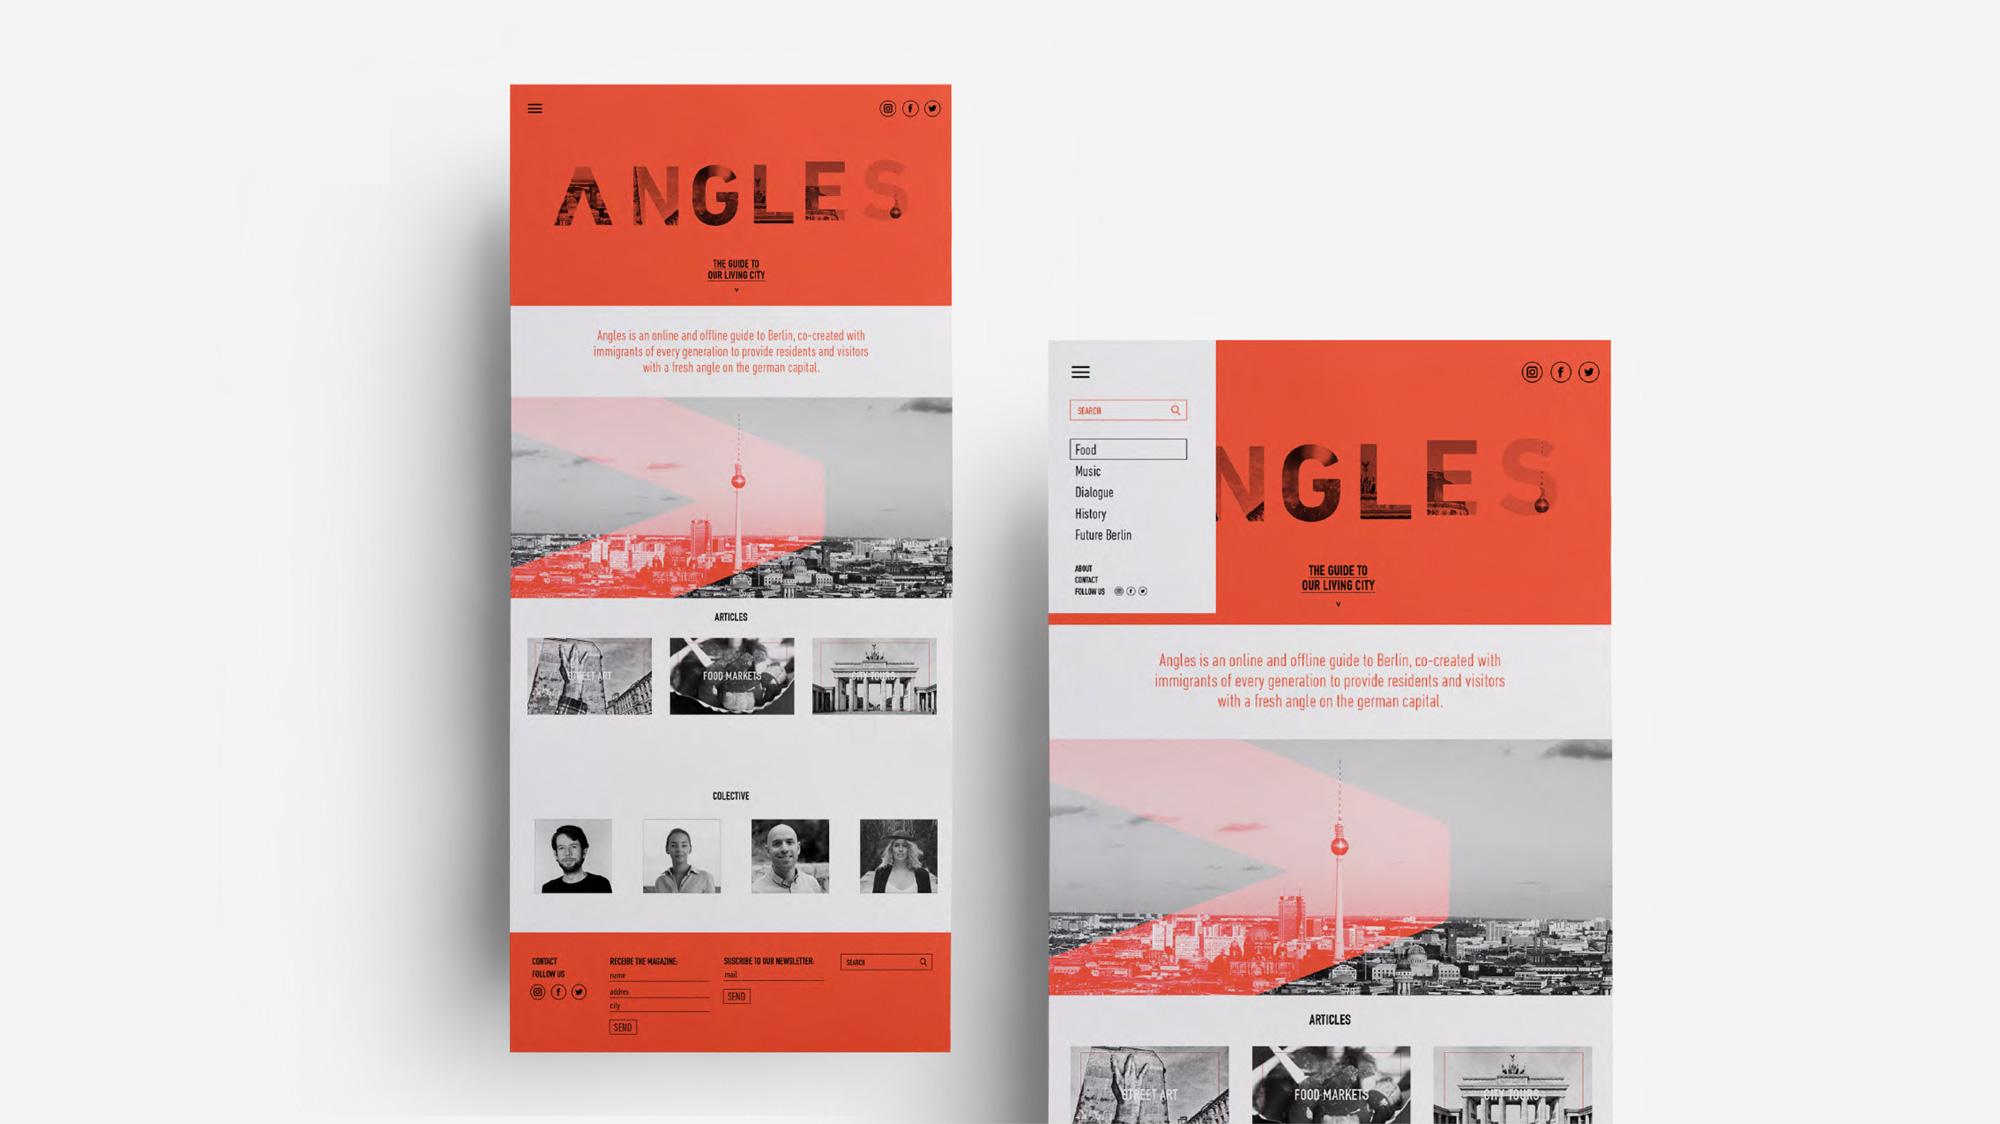 Angles_Branding1.1@2x